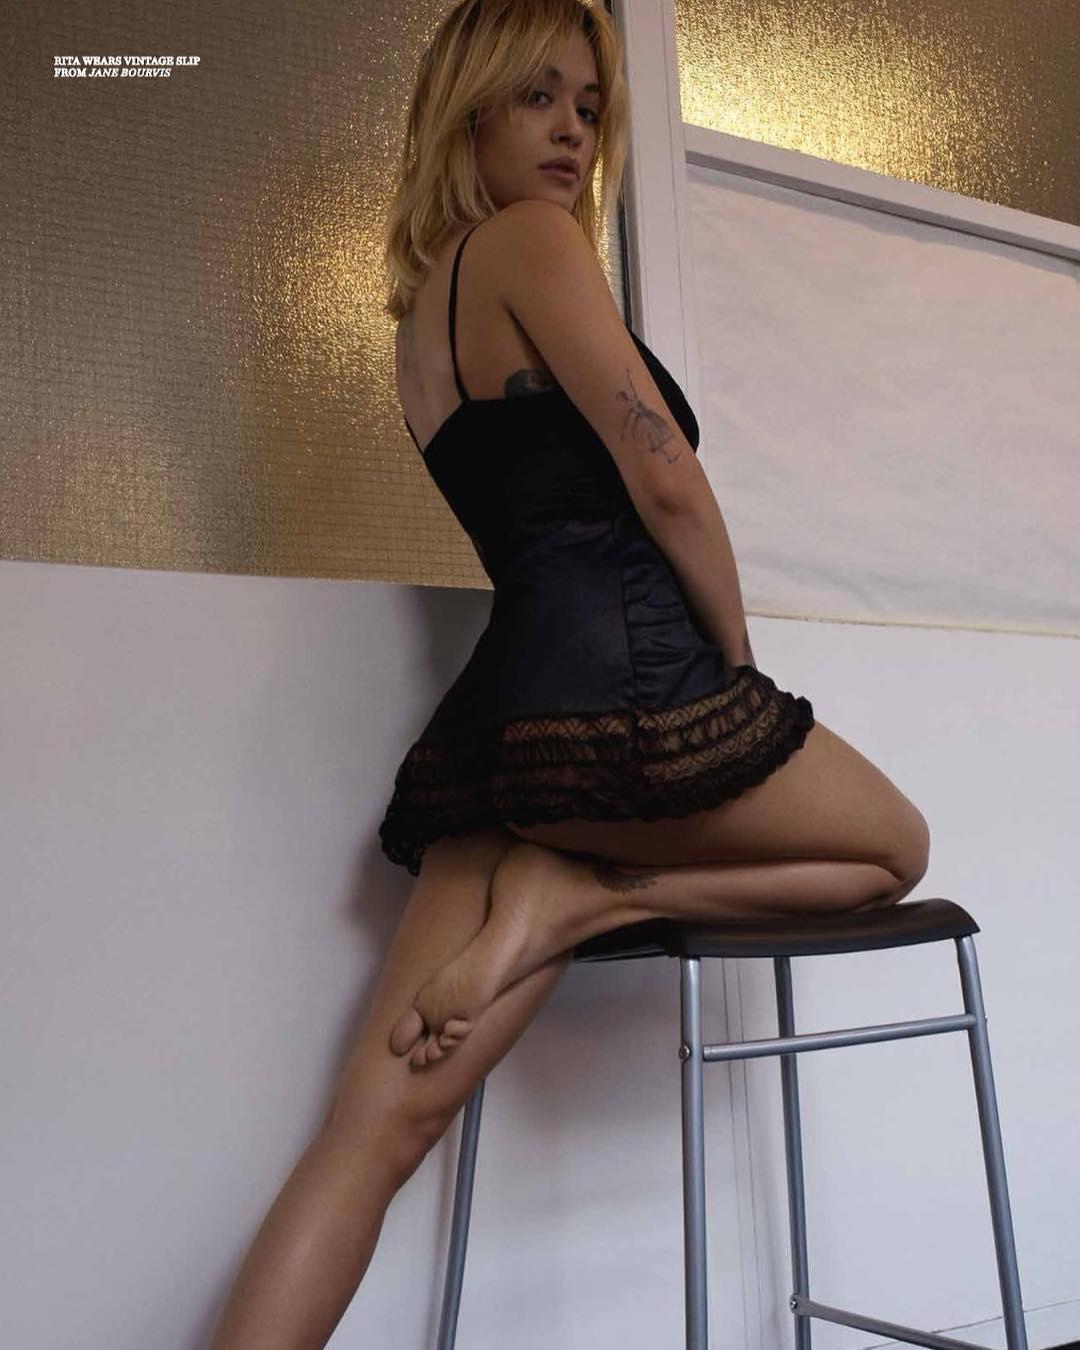 Rita Ora photo 4105 of 5876 pics, wallpaper - photo